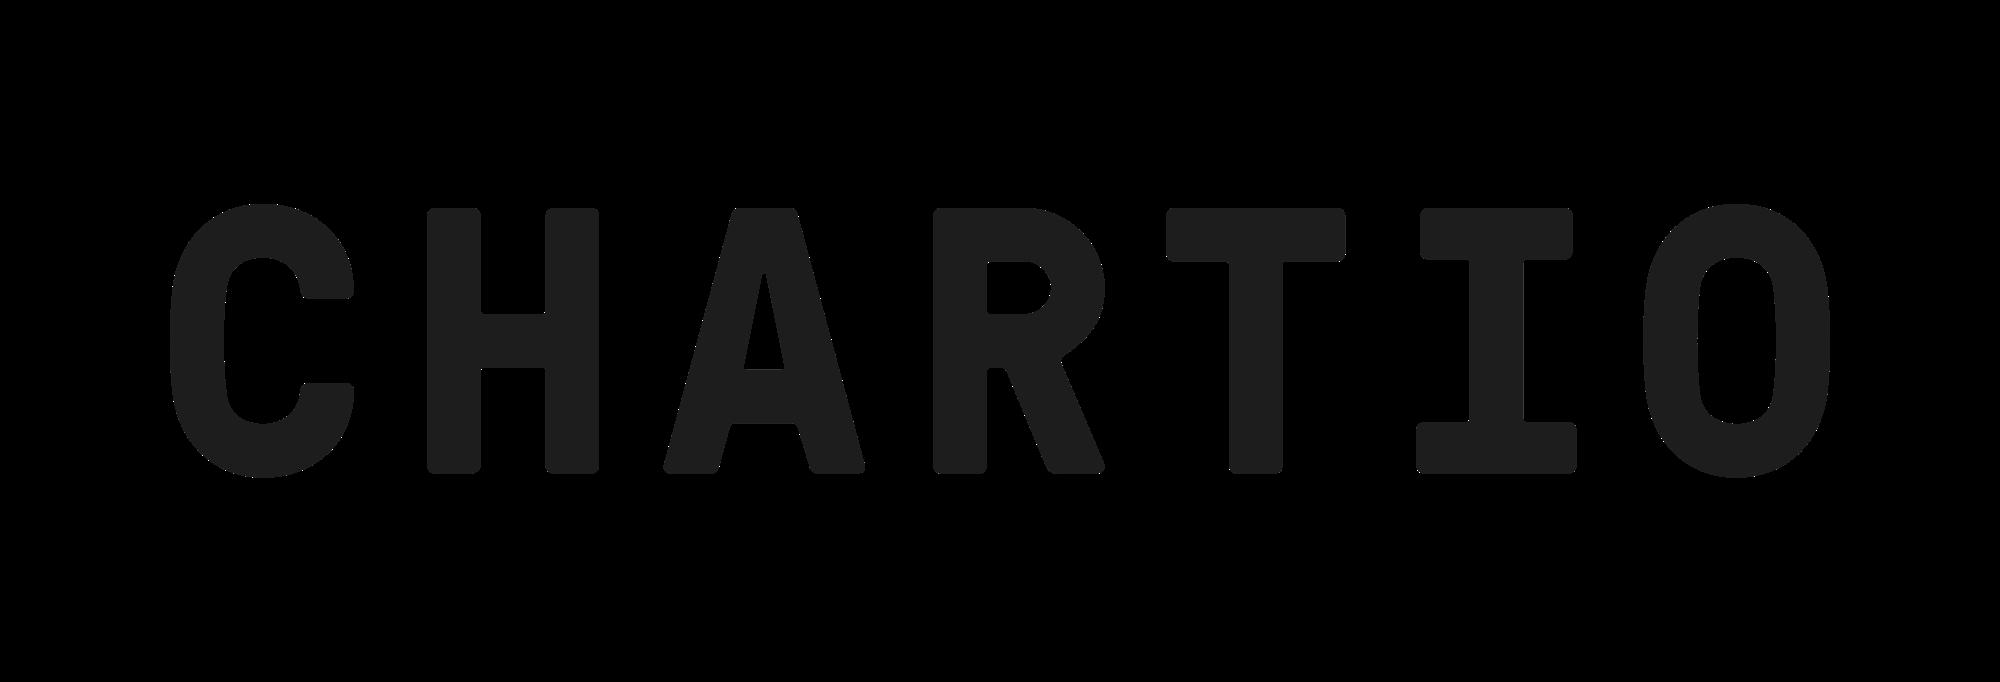 chartio-logo1